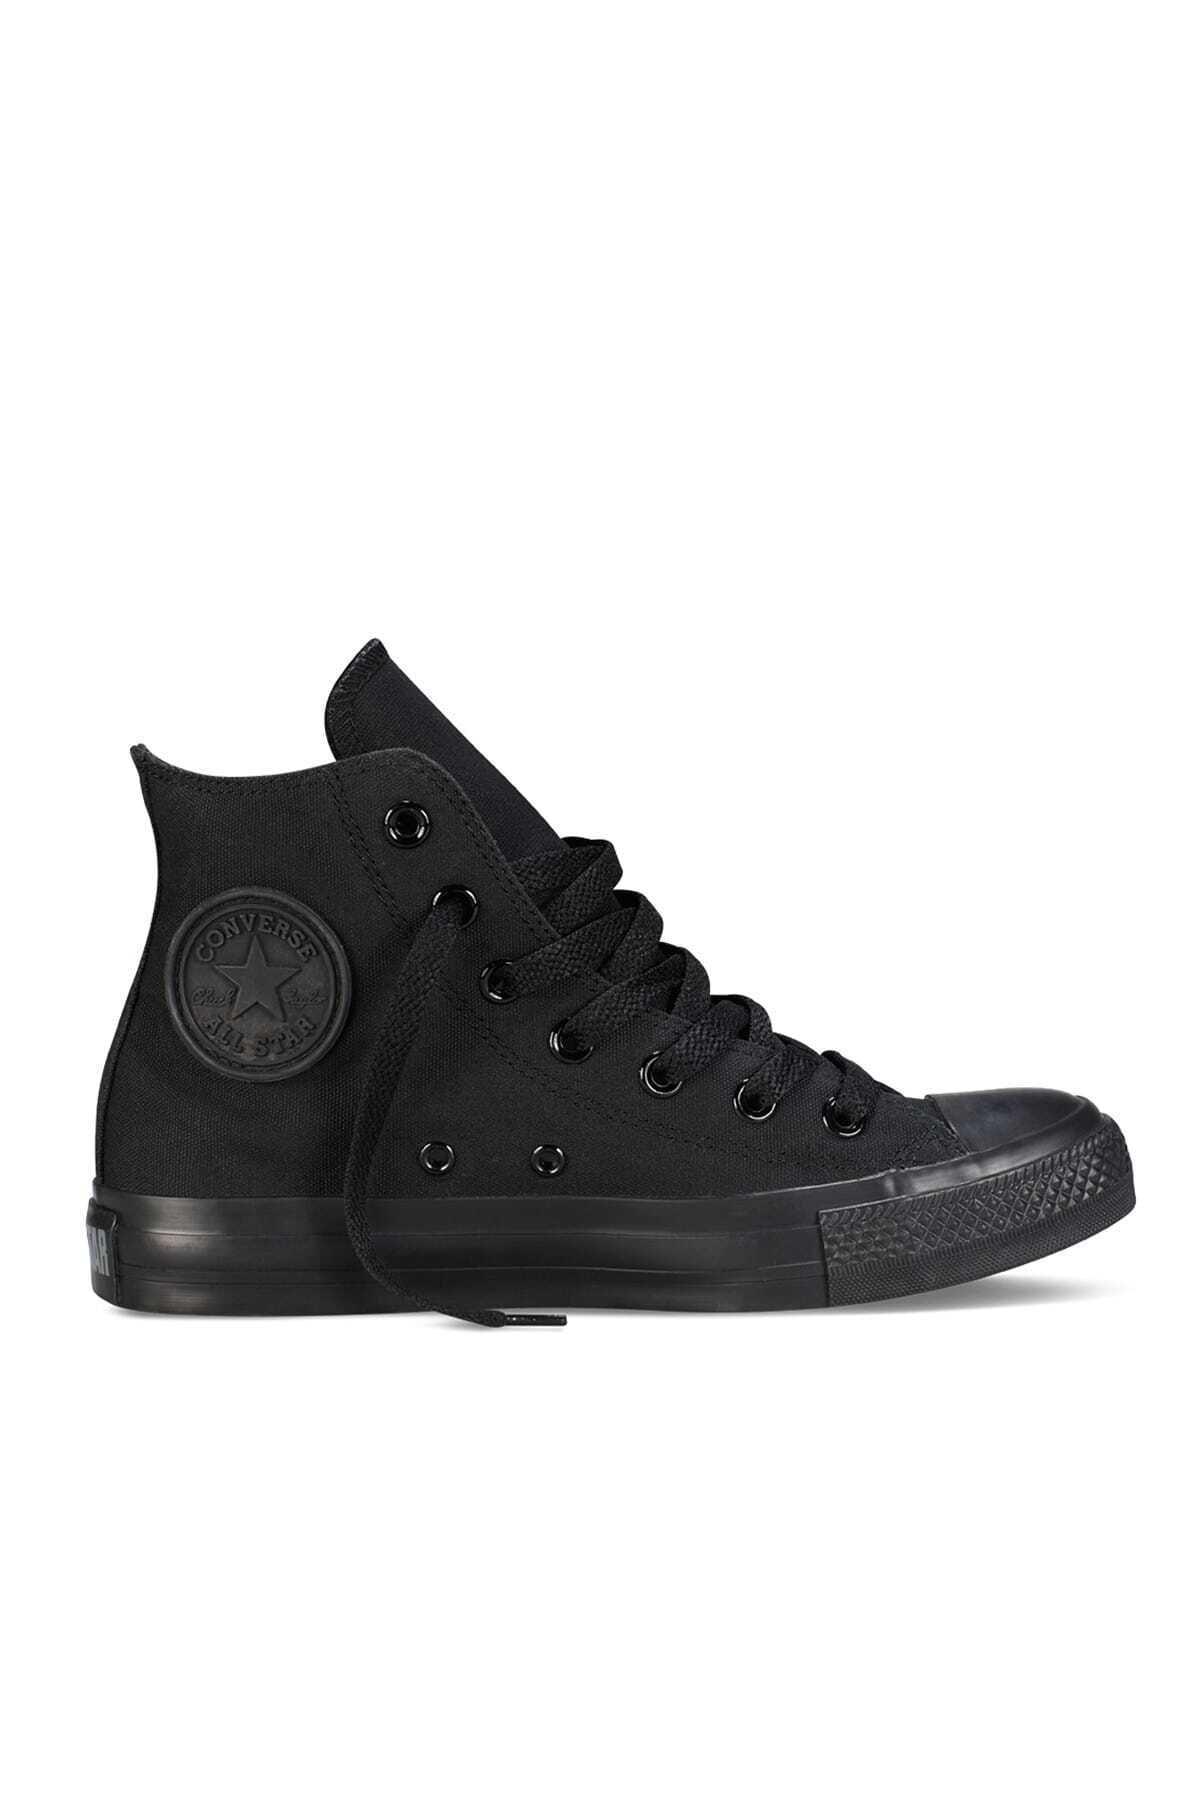 converse Unisex Sneaker M3310C CHUCK TAYLOR  - M3310C 1